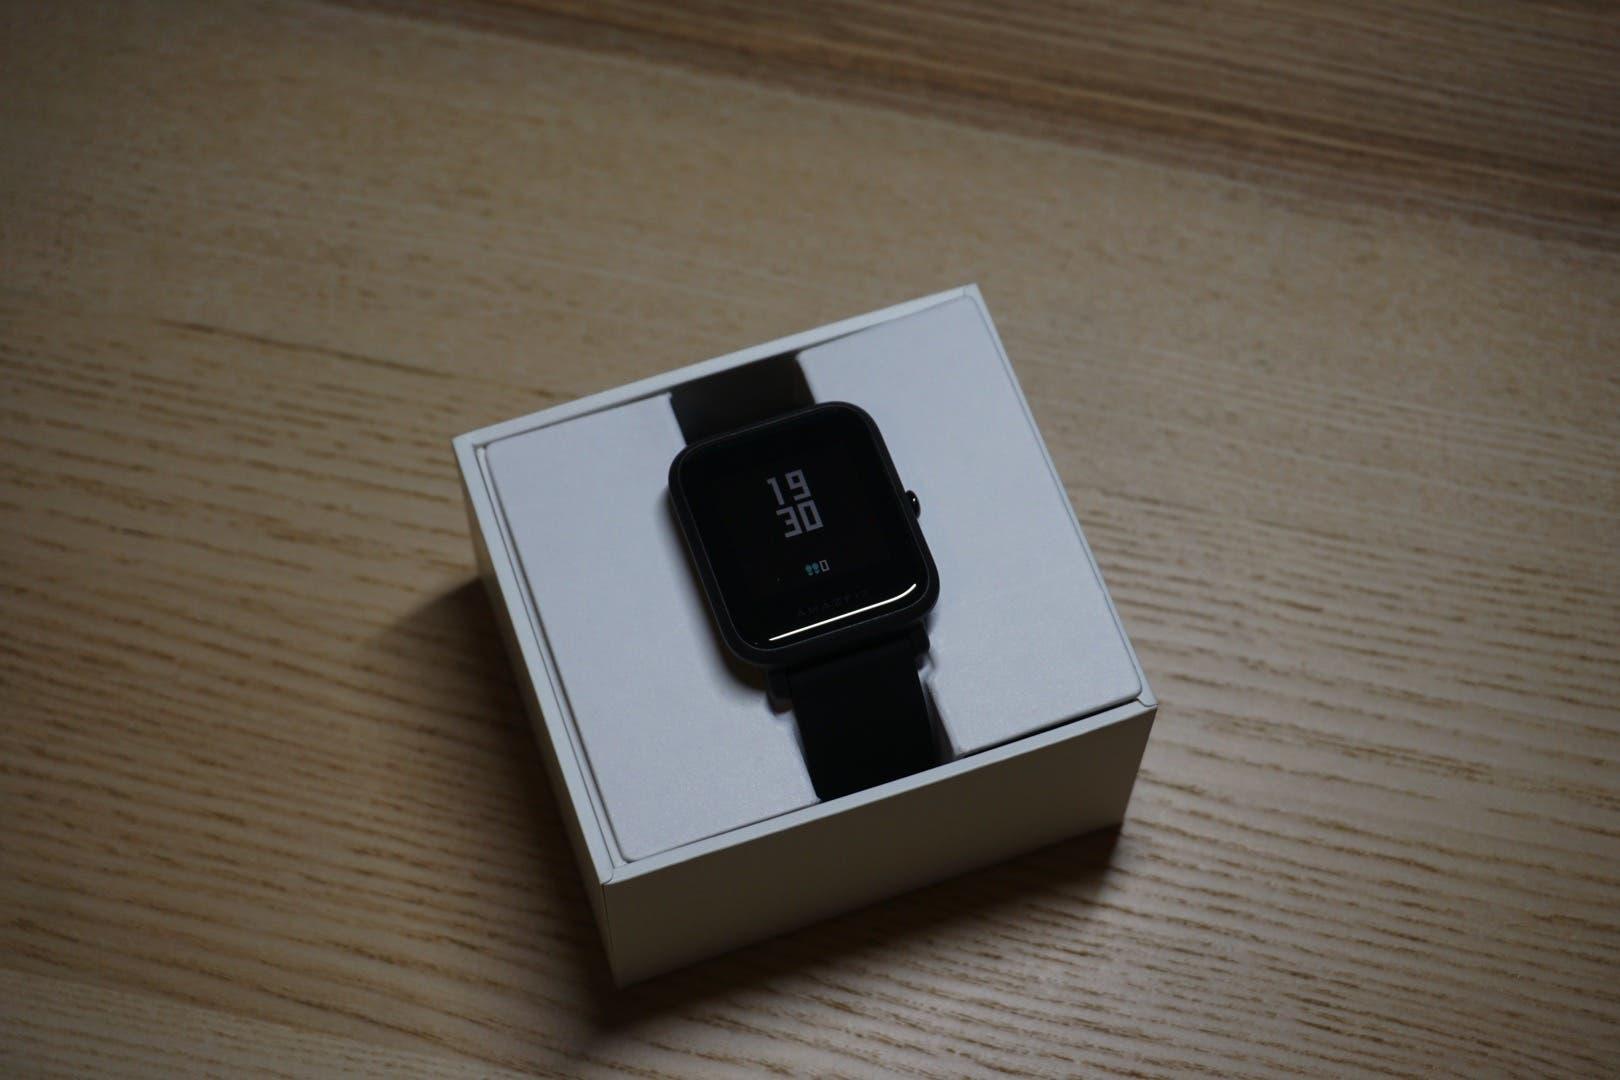 Huami AMAZFIT Smartwatch review